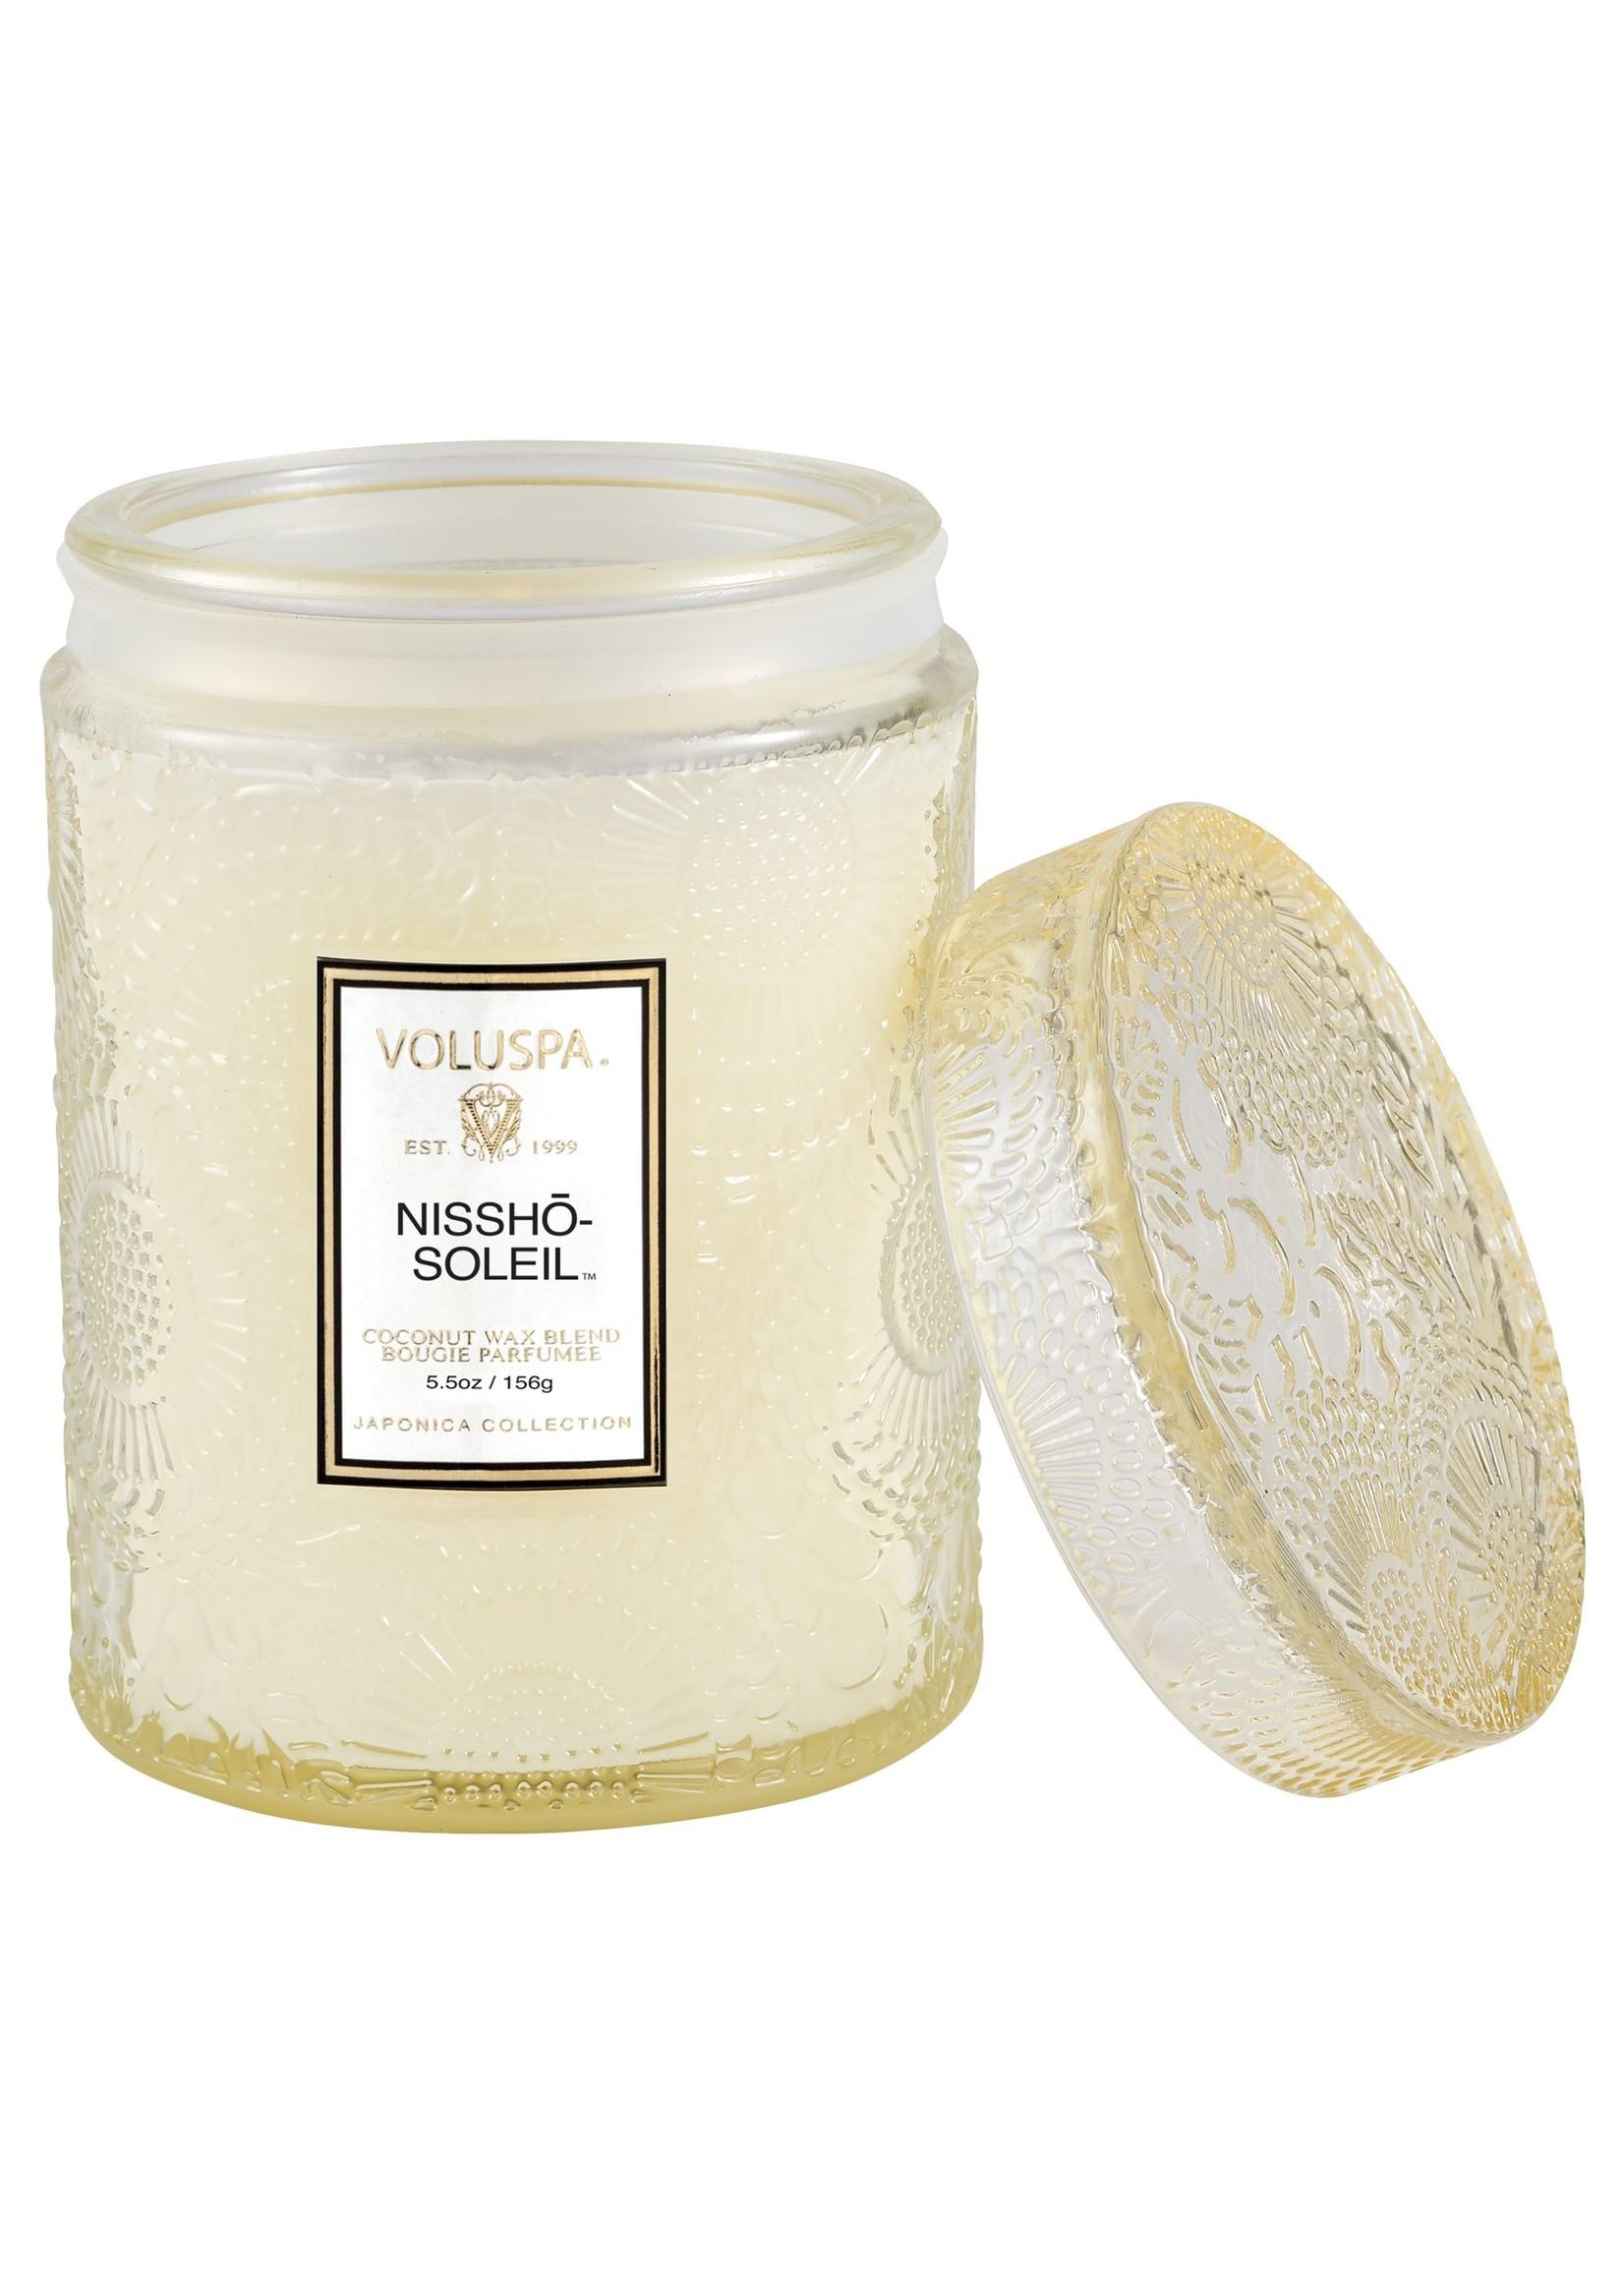 Nissho Soleil small jar candle